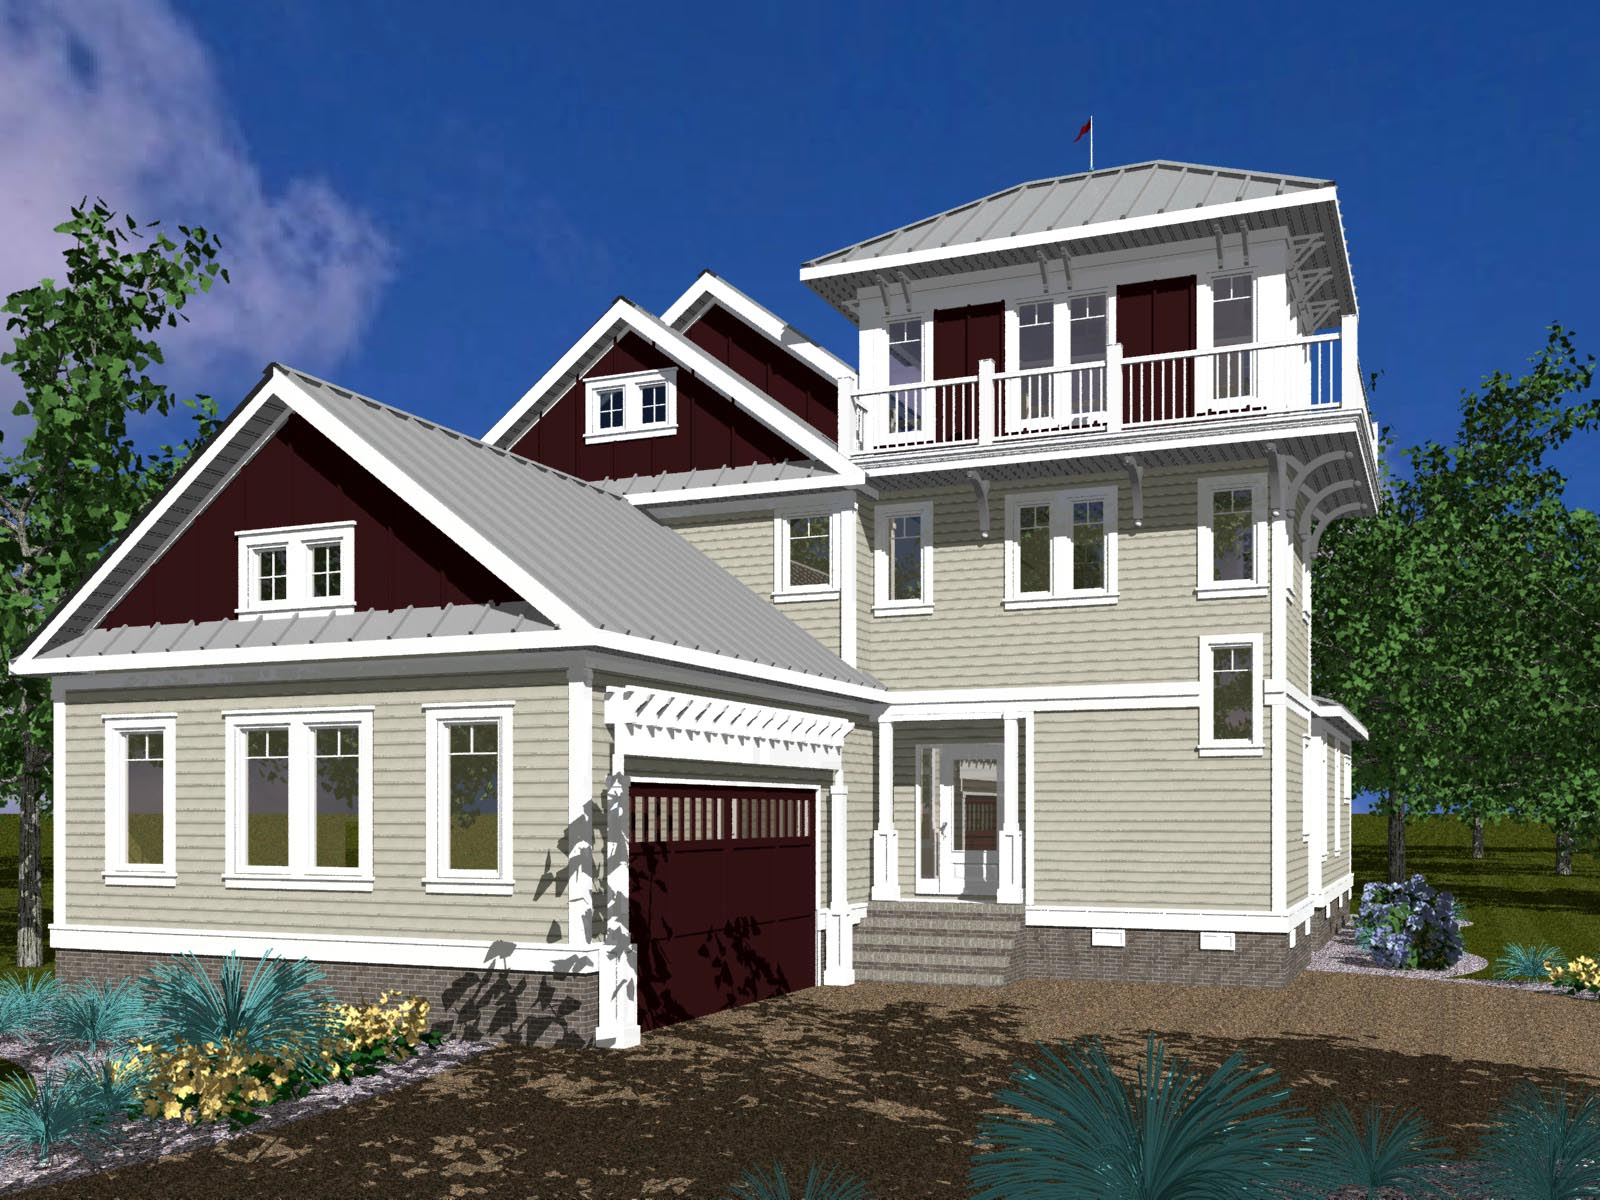 Third floor watch tower 30038rt architectural designs for Architecturaldesigns com house plan 56364sm asp